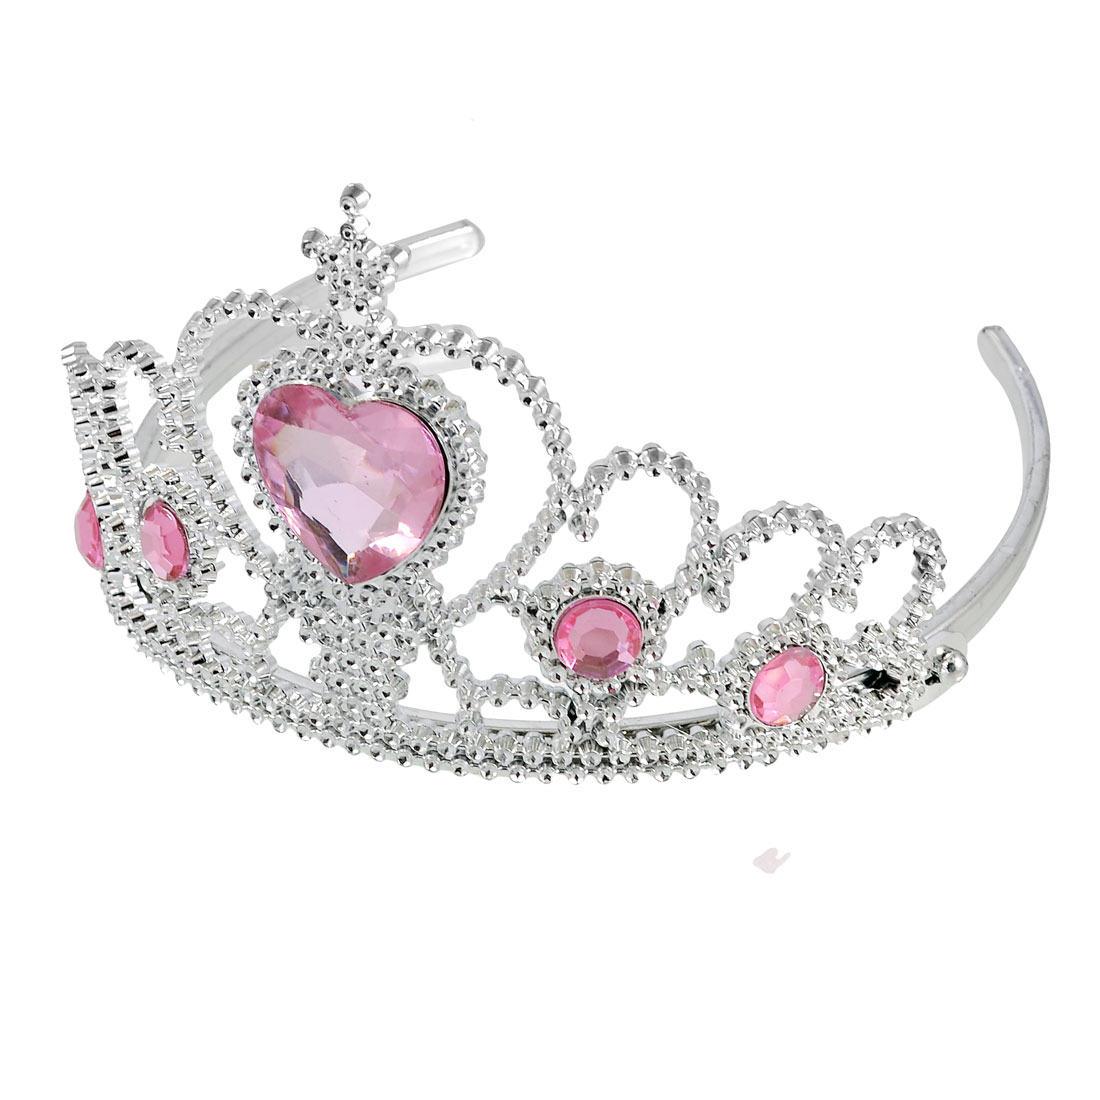 Wedding Bridal Plastic Heart Shaped Faux Rhinestone Inlaid Crown Headband Pink